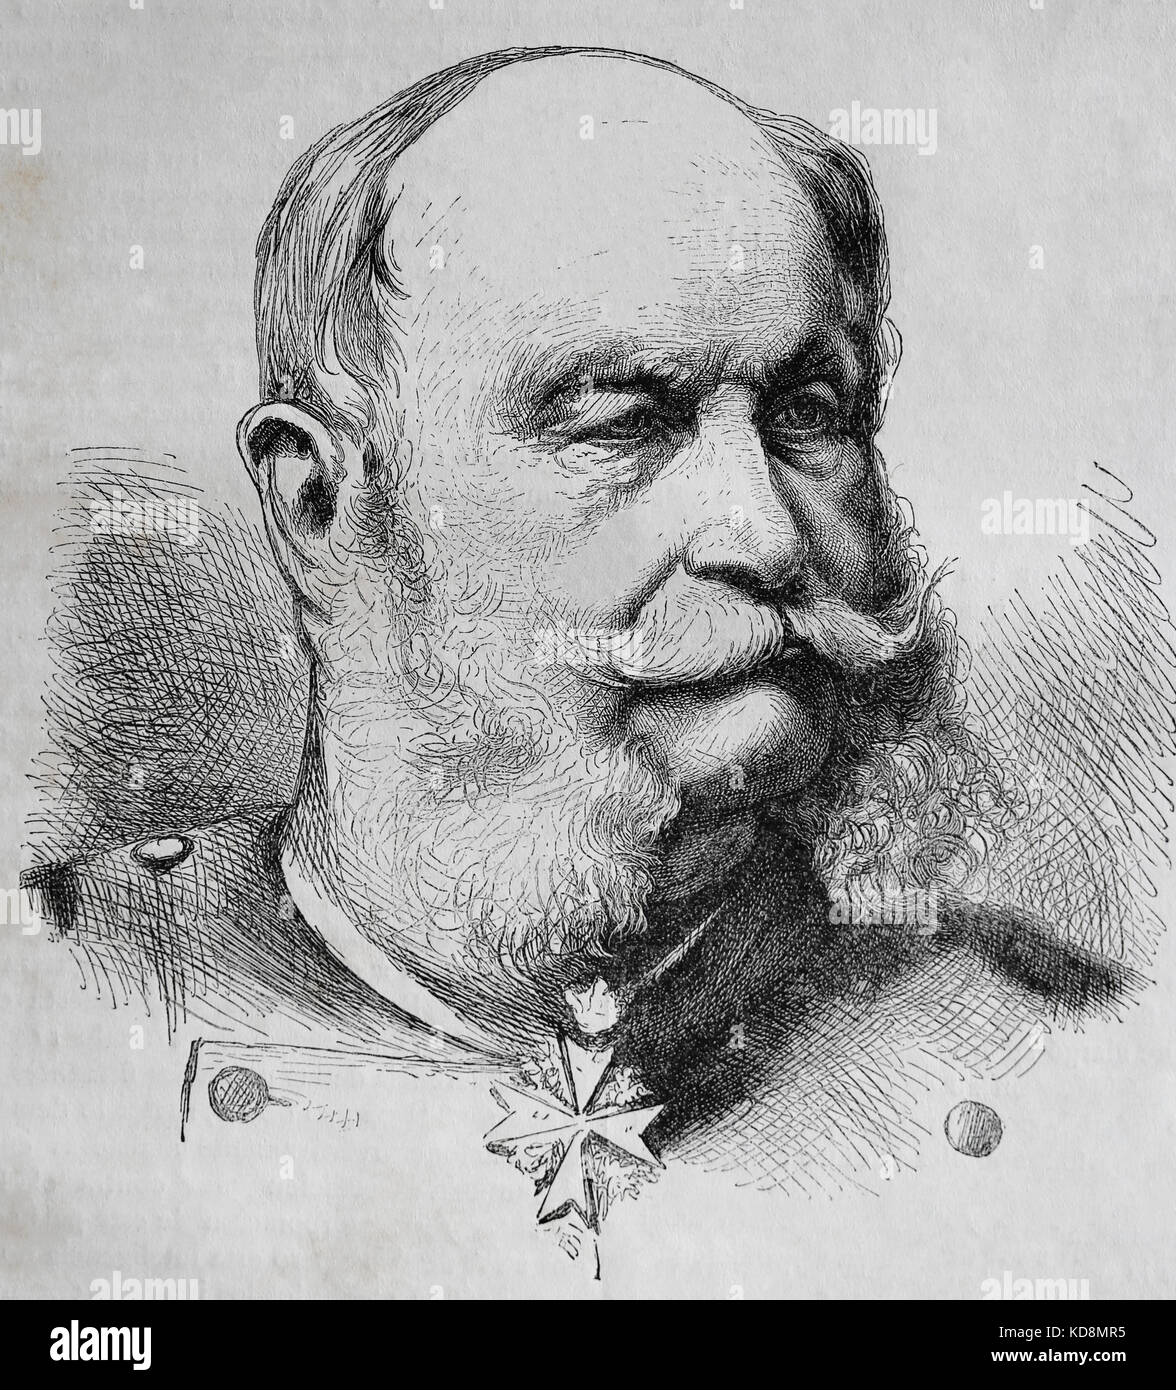 William I, German Emperor (1797-1888). Engraving, 1883. Portrait. Stock Photo